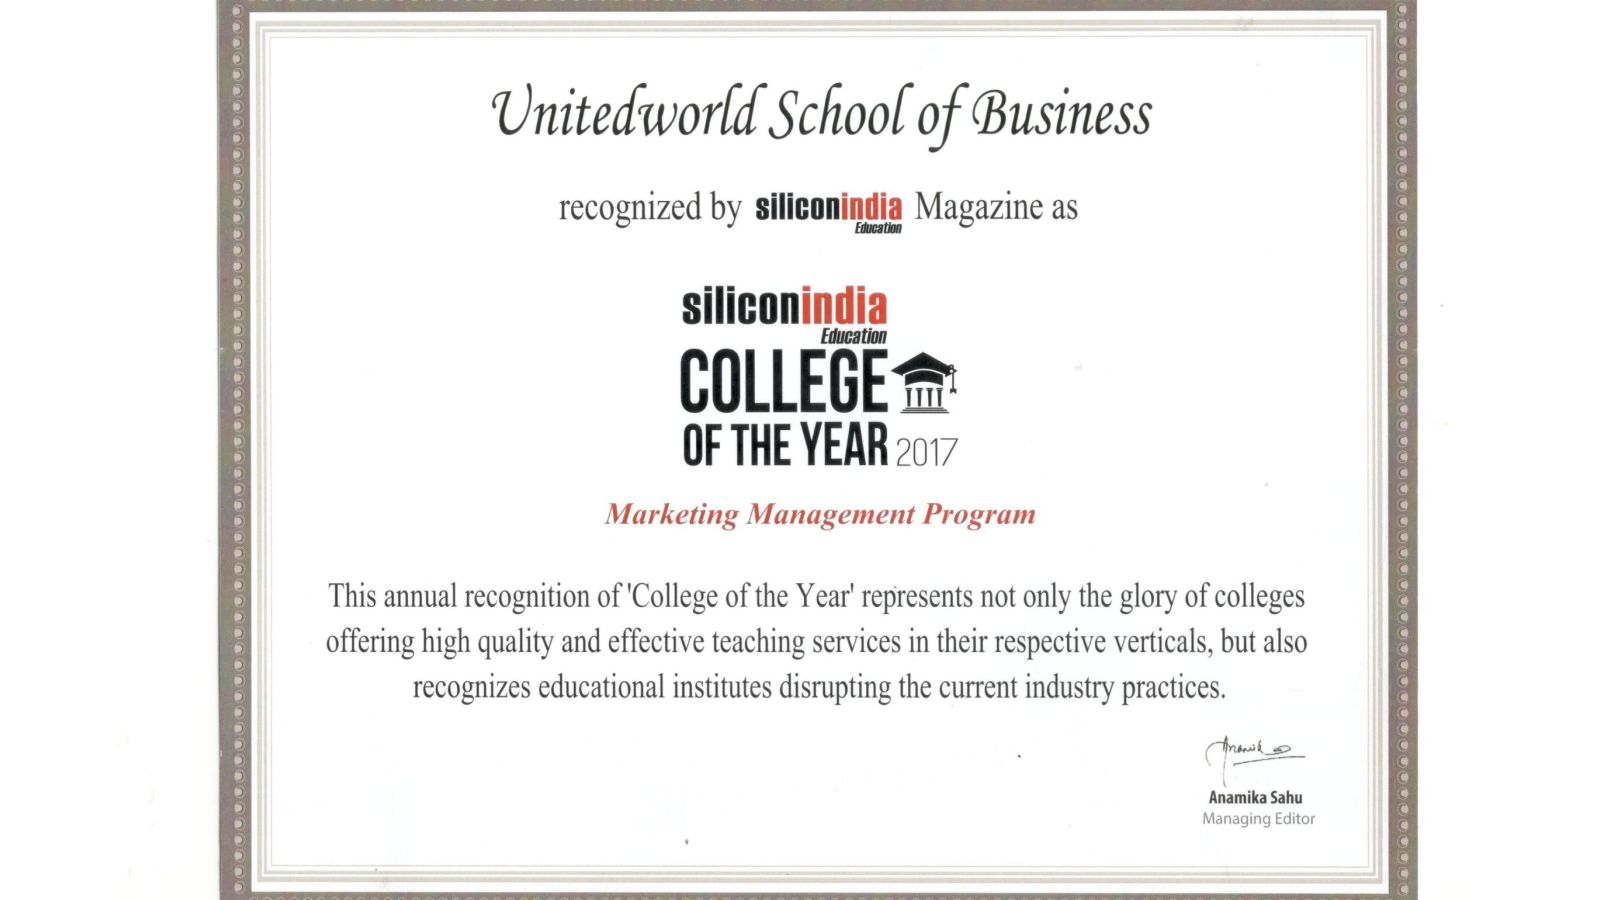 College of the year 2017 – Marketing Management Program Image